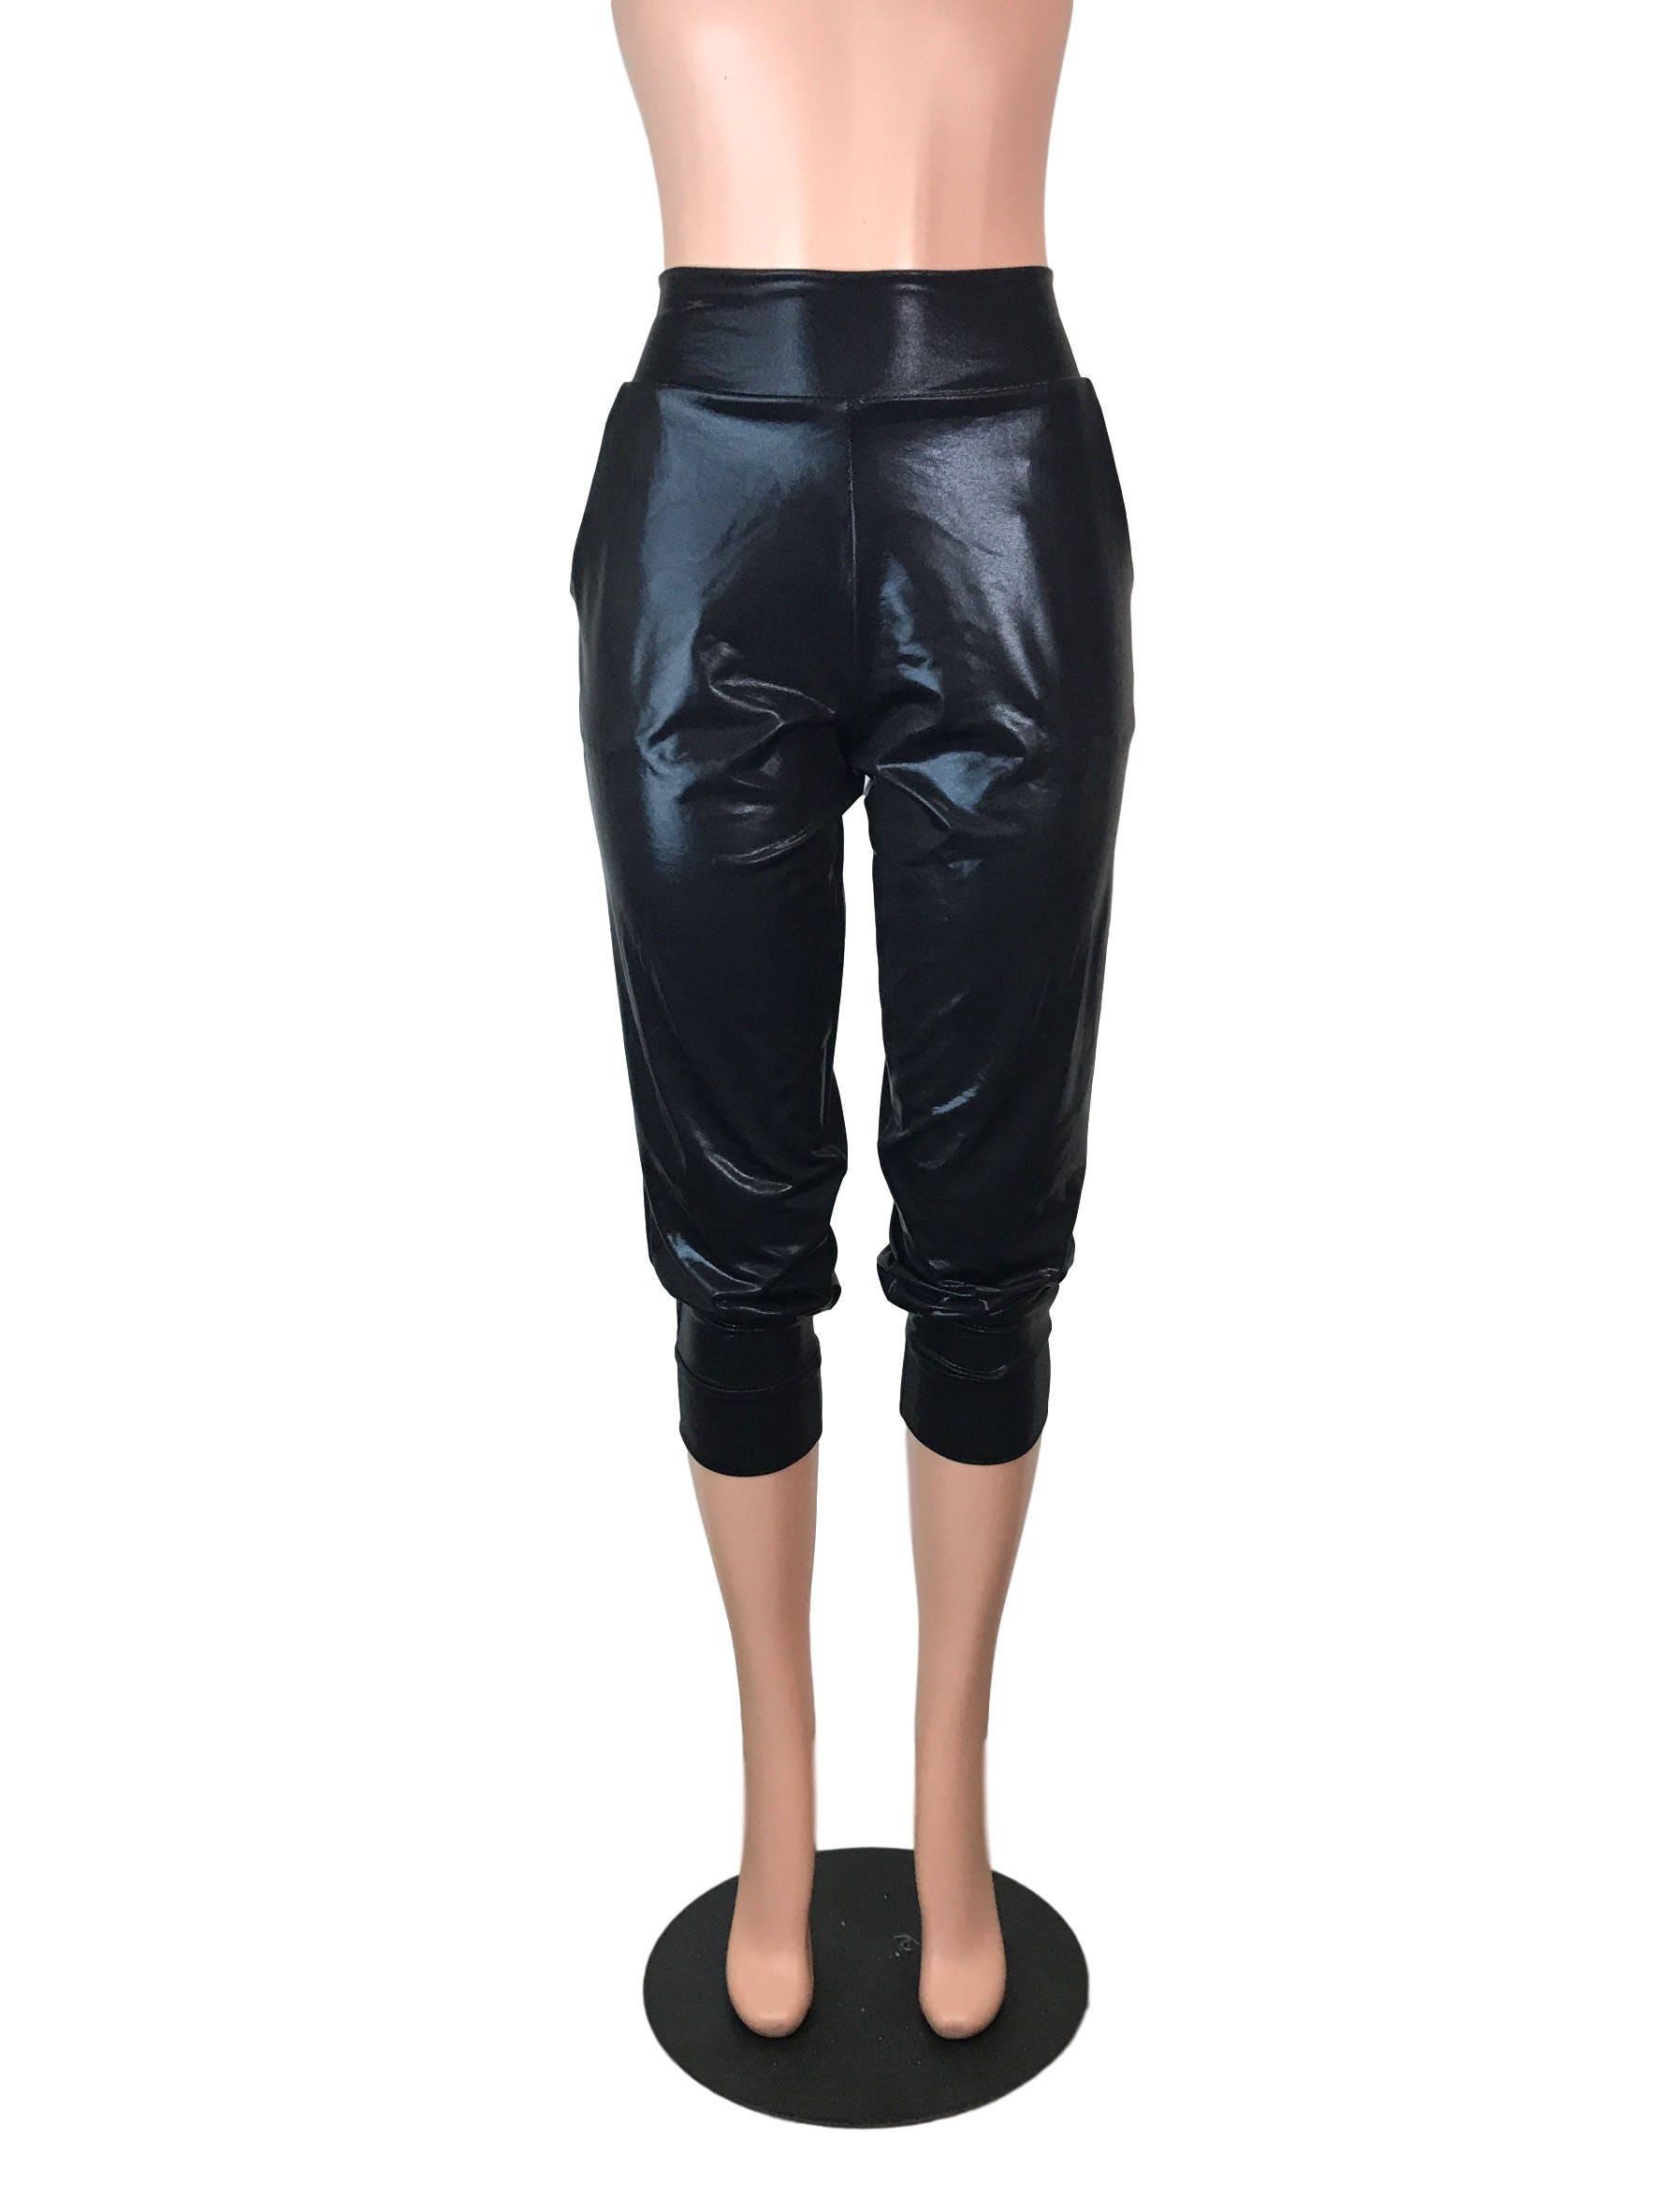 def67db91670f Black Mystique Metallic Joggers w/ Pockets High Waisted   Etsy